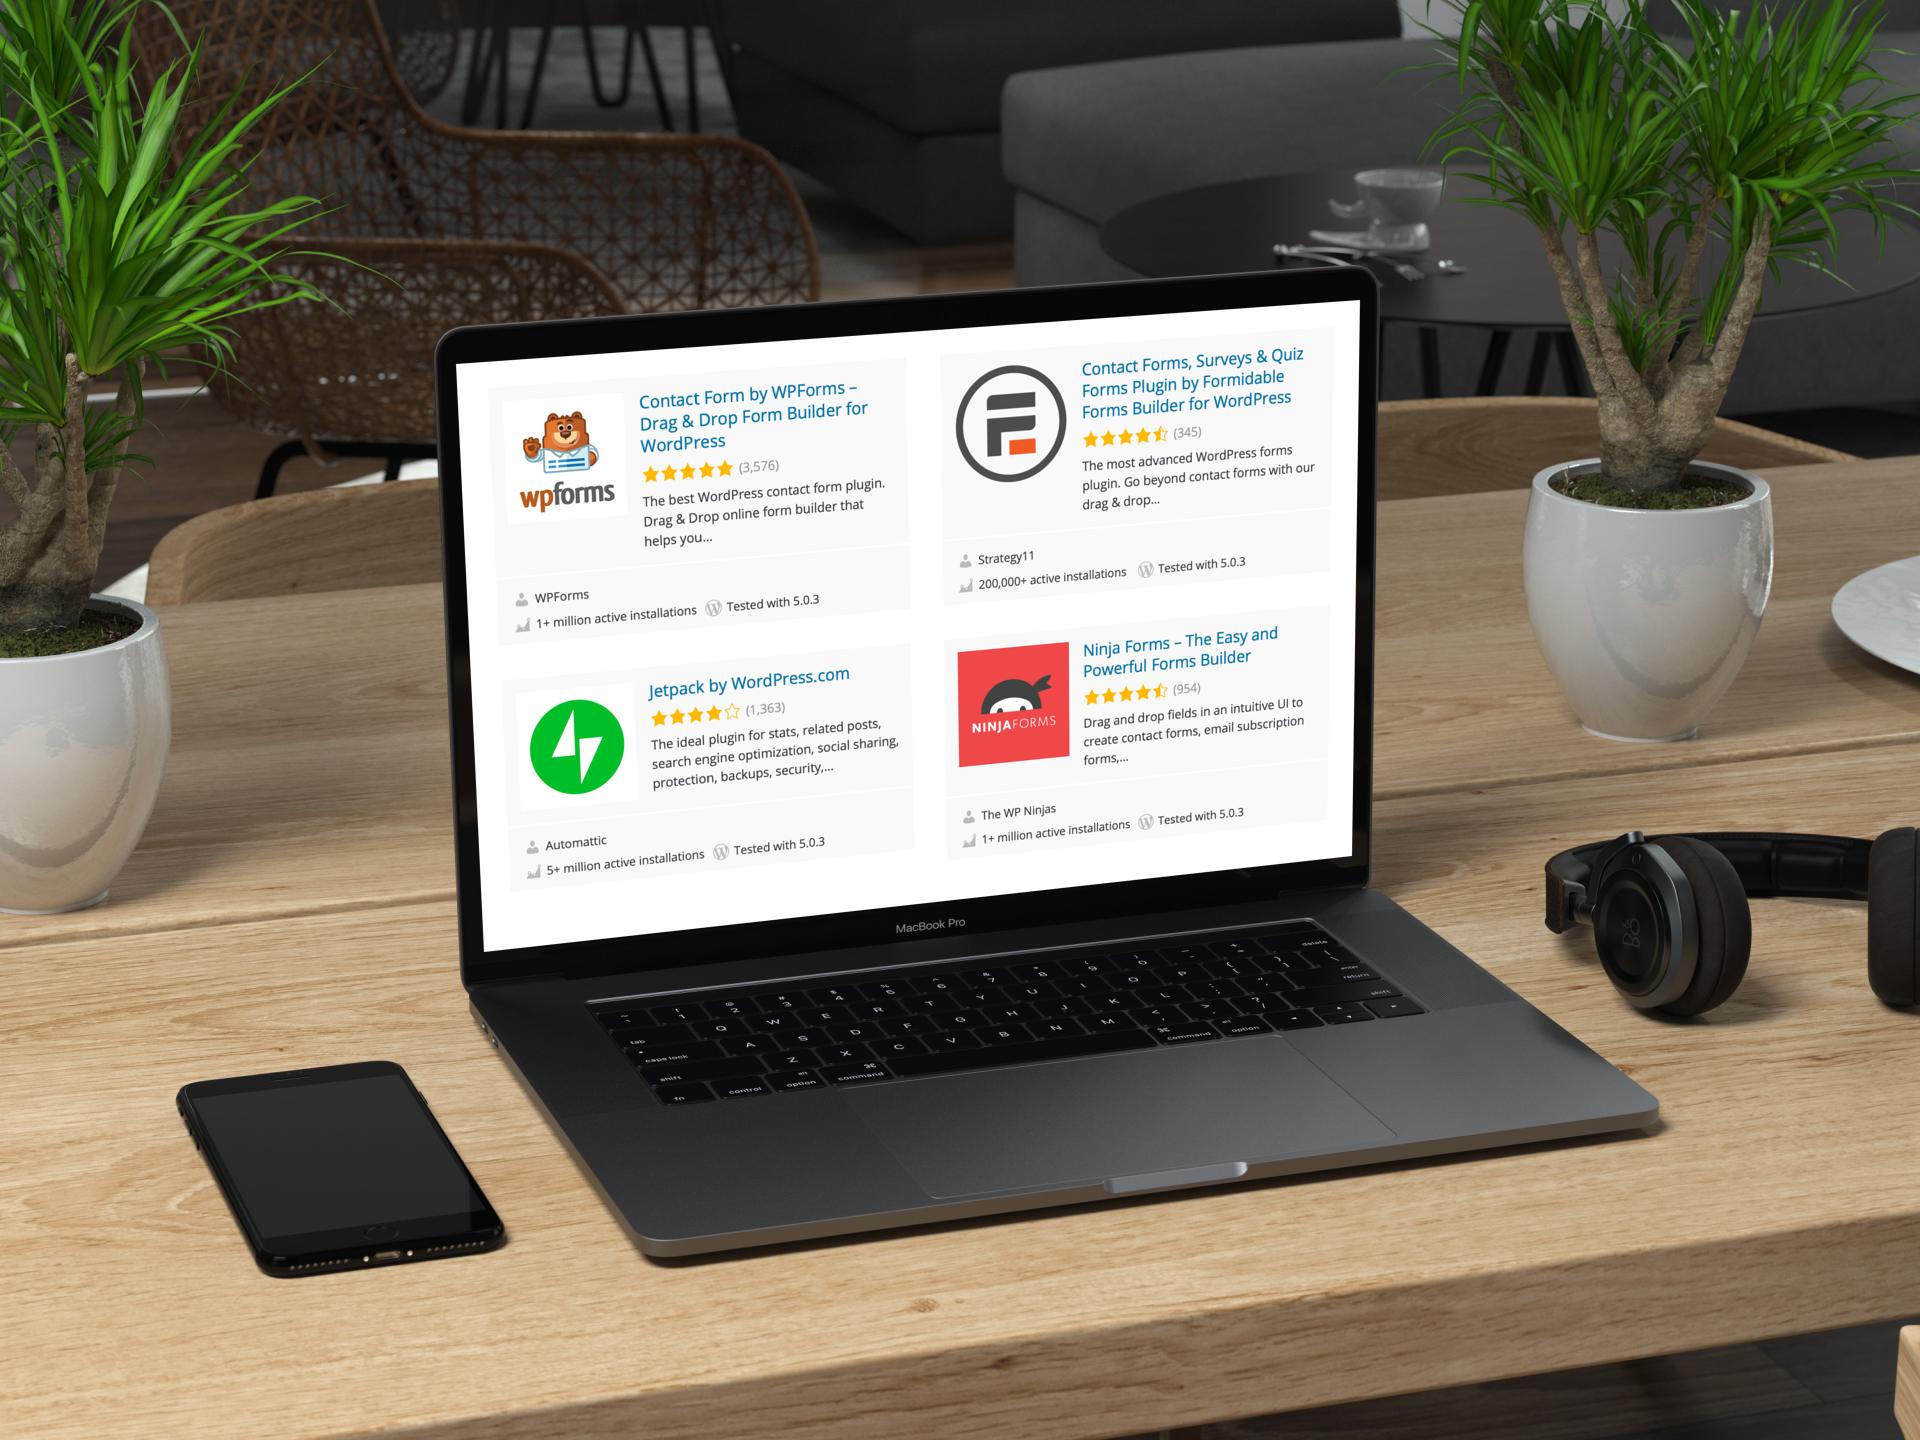 5 Best Freemium Contact Form Plugins for Wordpress